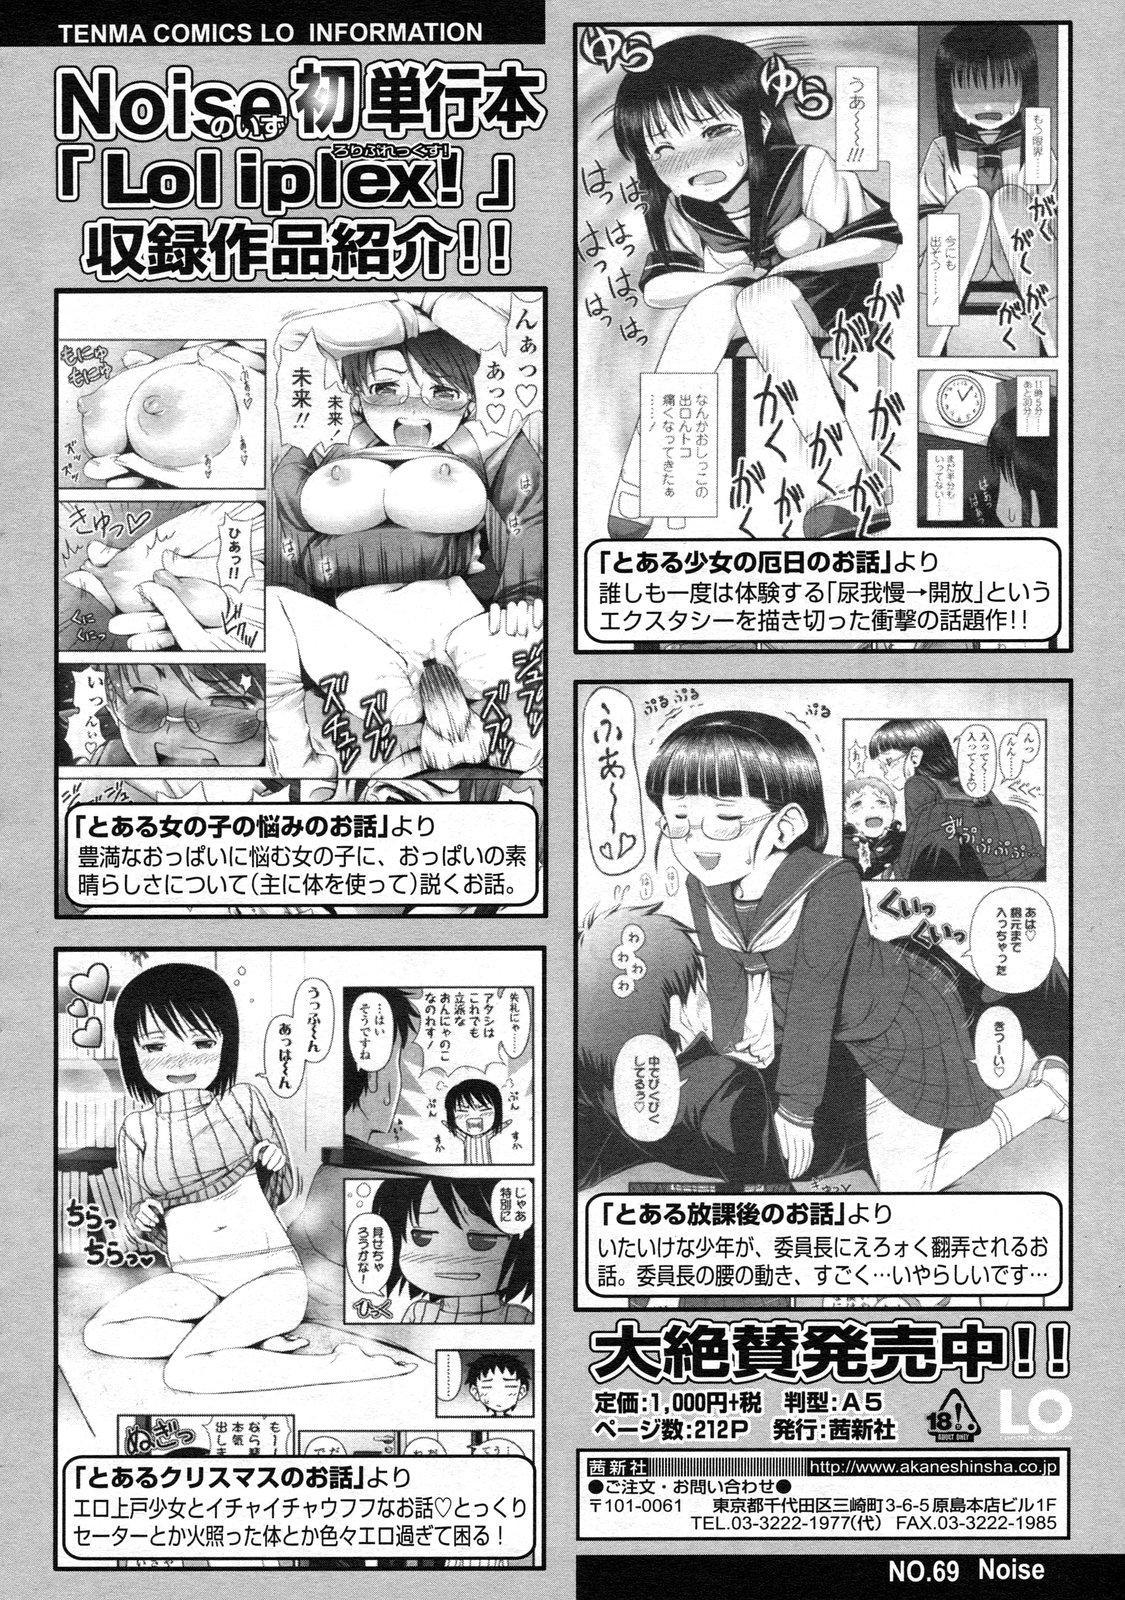 COMIC LO 2009-09 Vol. 66 238